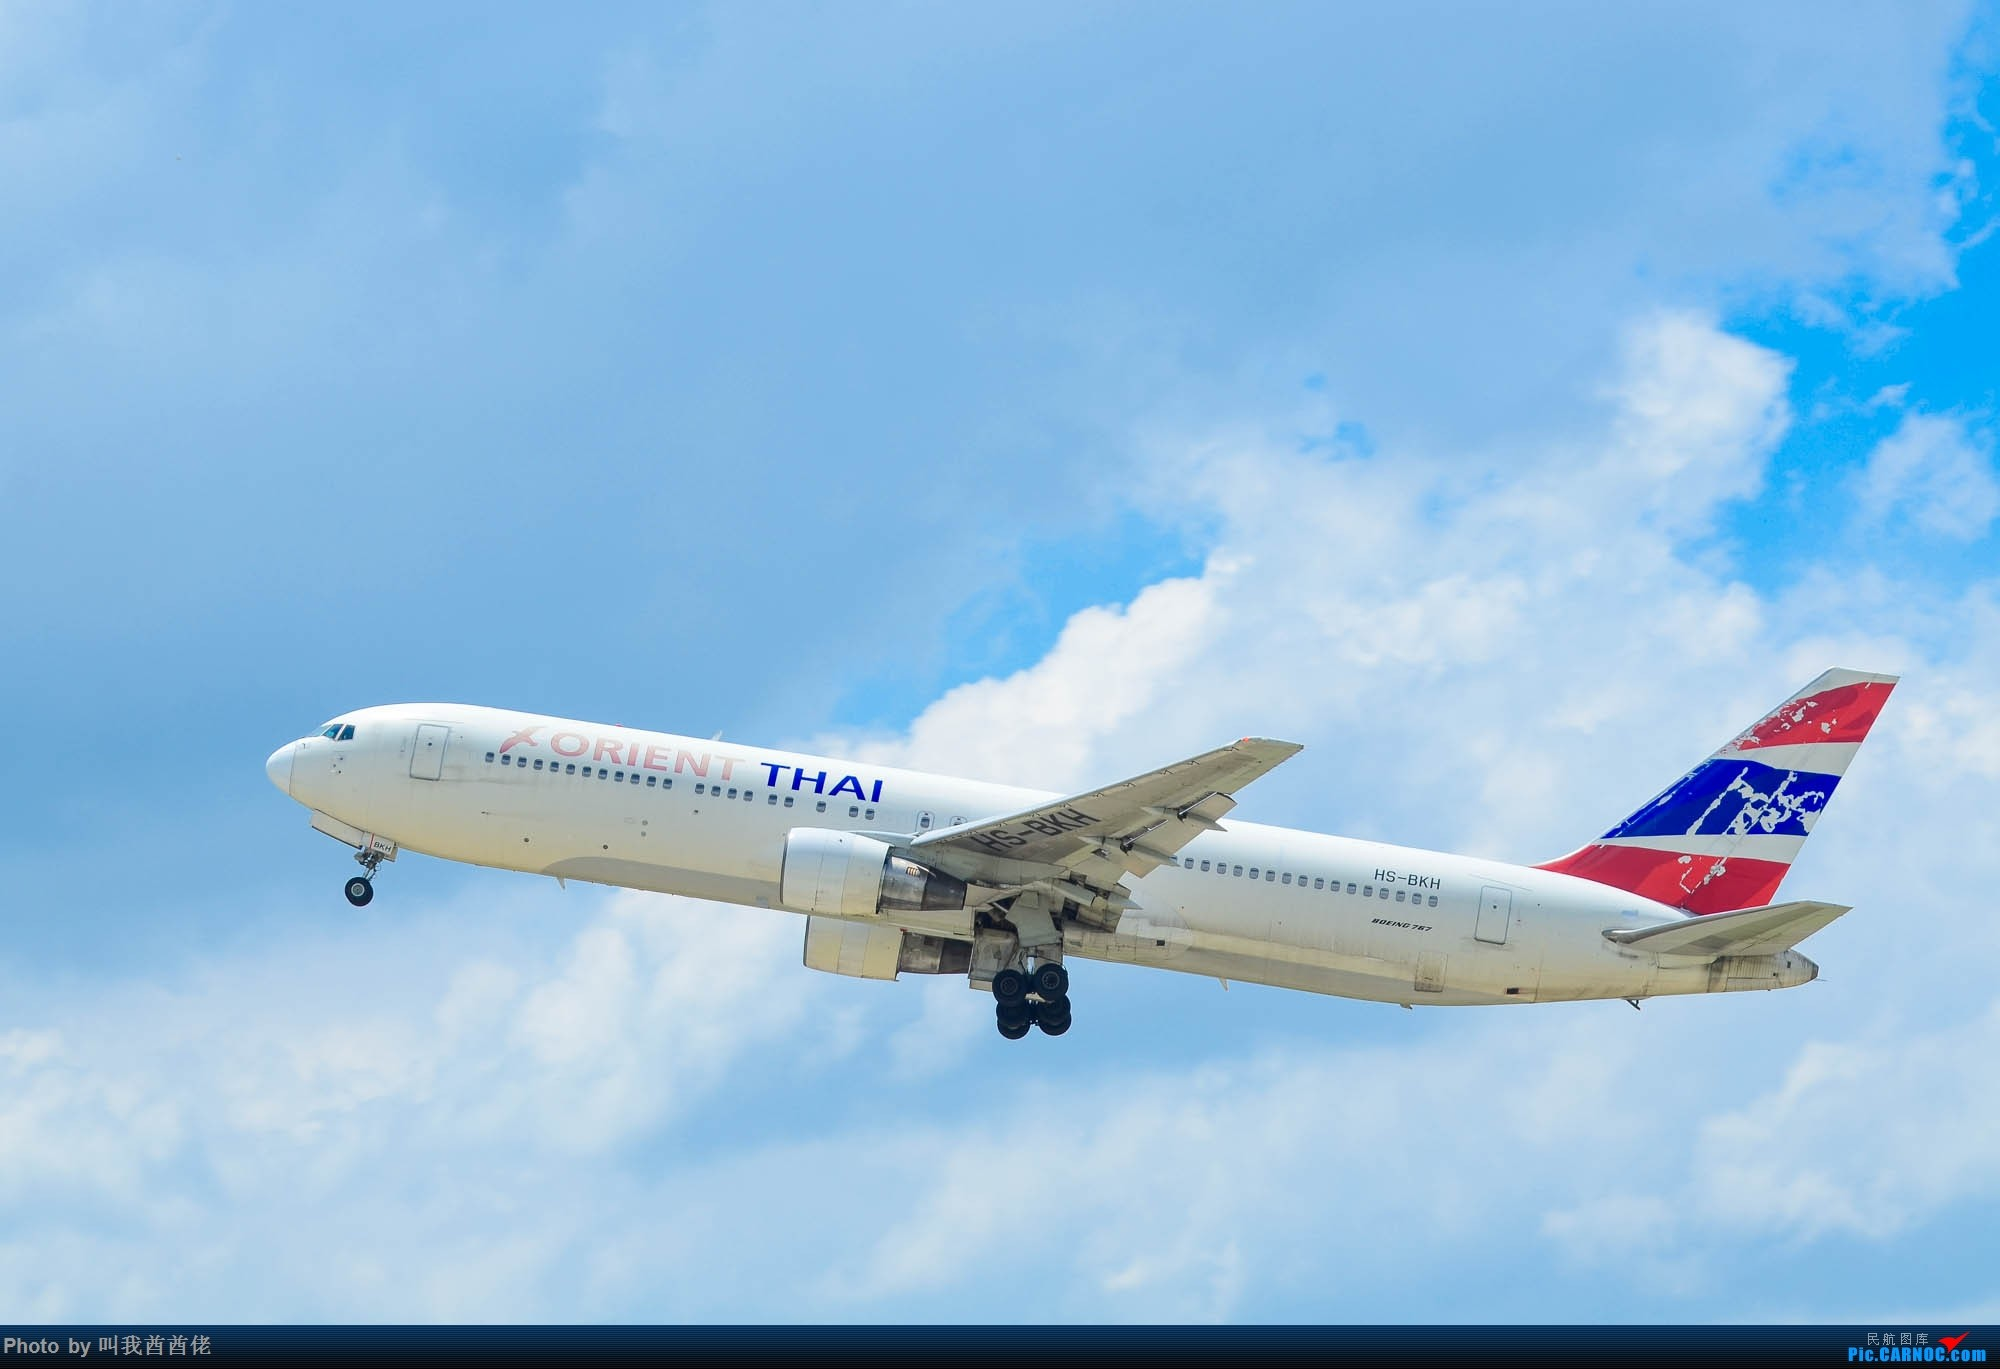 Re:[原创]南宁拍机记(蓝天白云) BOEING 767 HS-BKH 中国南宁吴圩国际机场